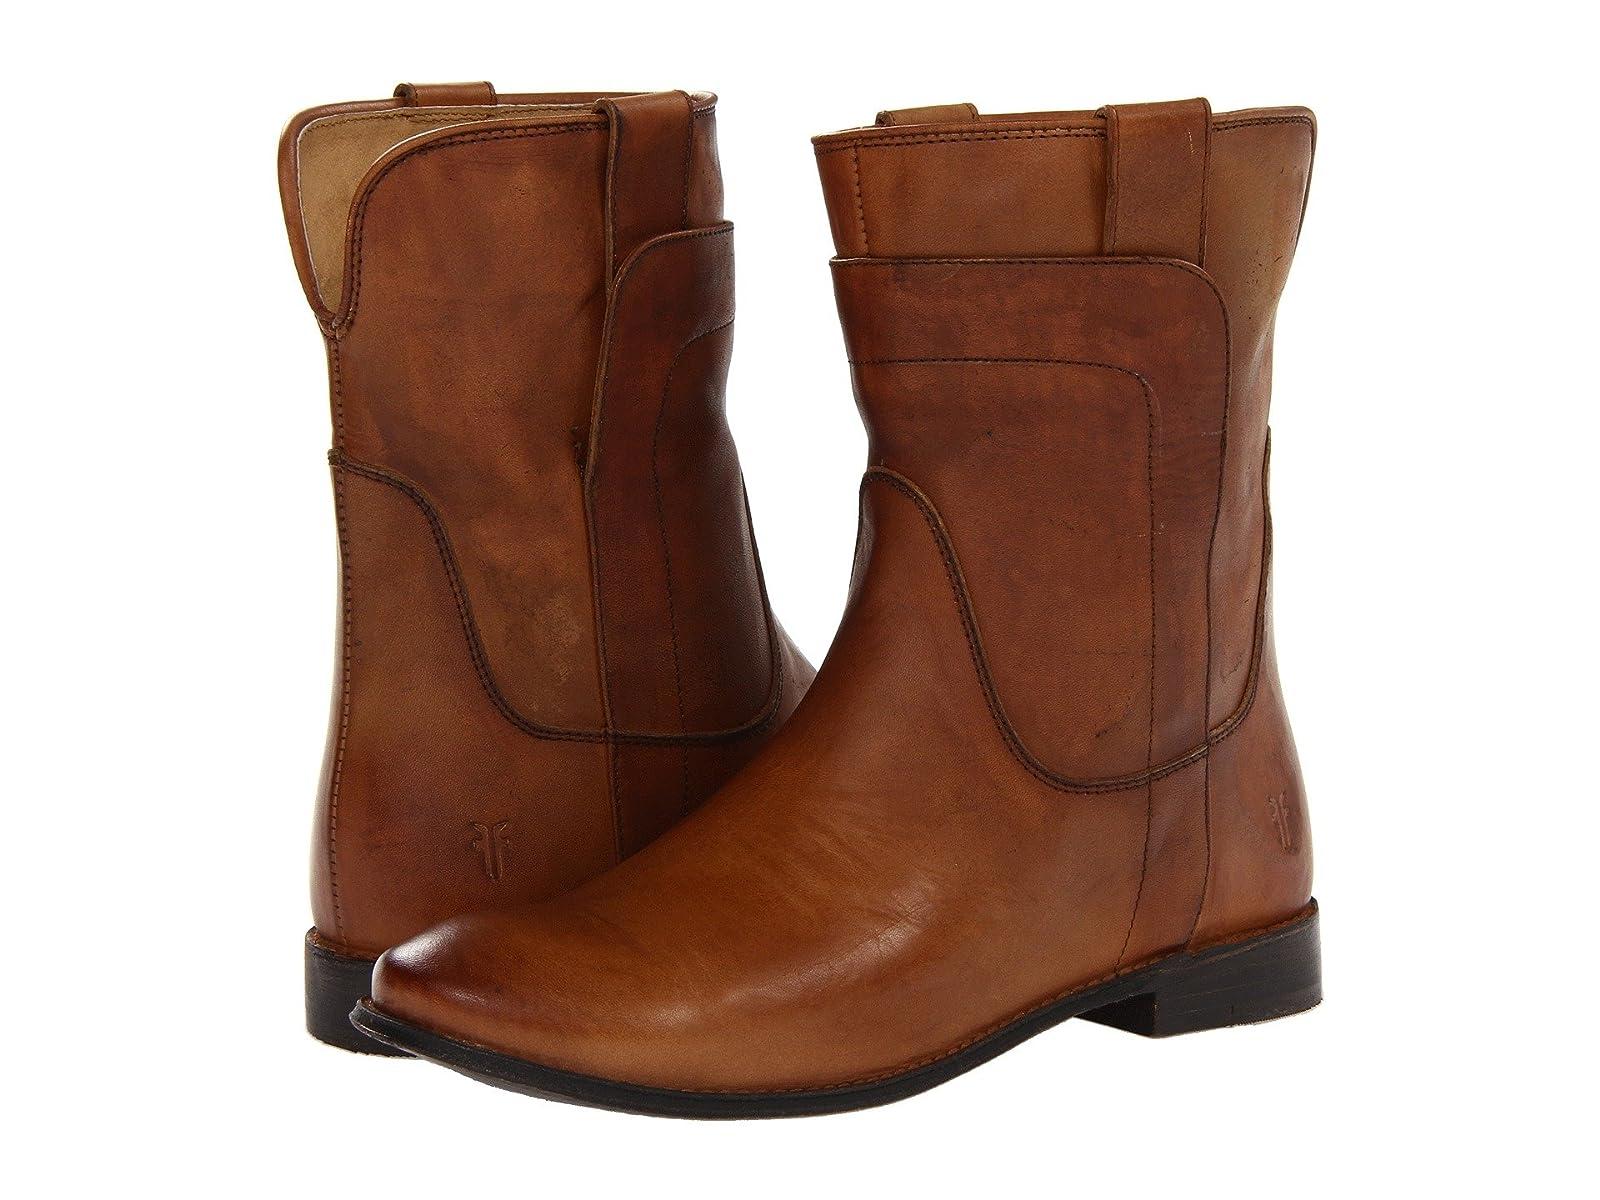 Frye Paige Short RidingCheap and distinctive eye-catching shoes